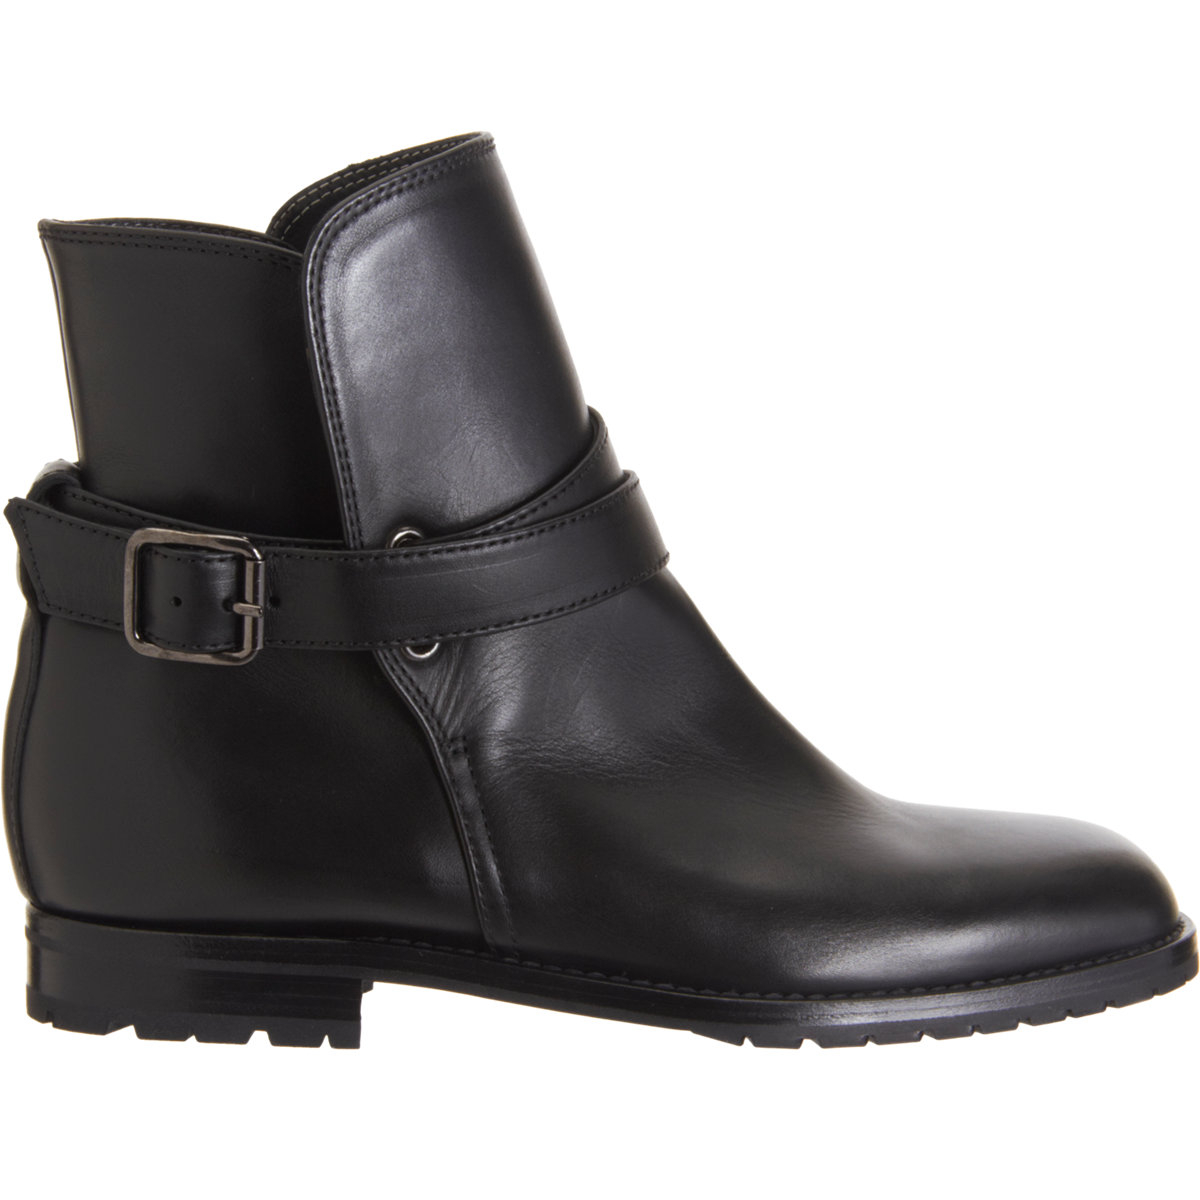 Manolo blahnik Sulgamaba Ankle Boots in Black   Lyst